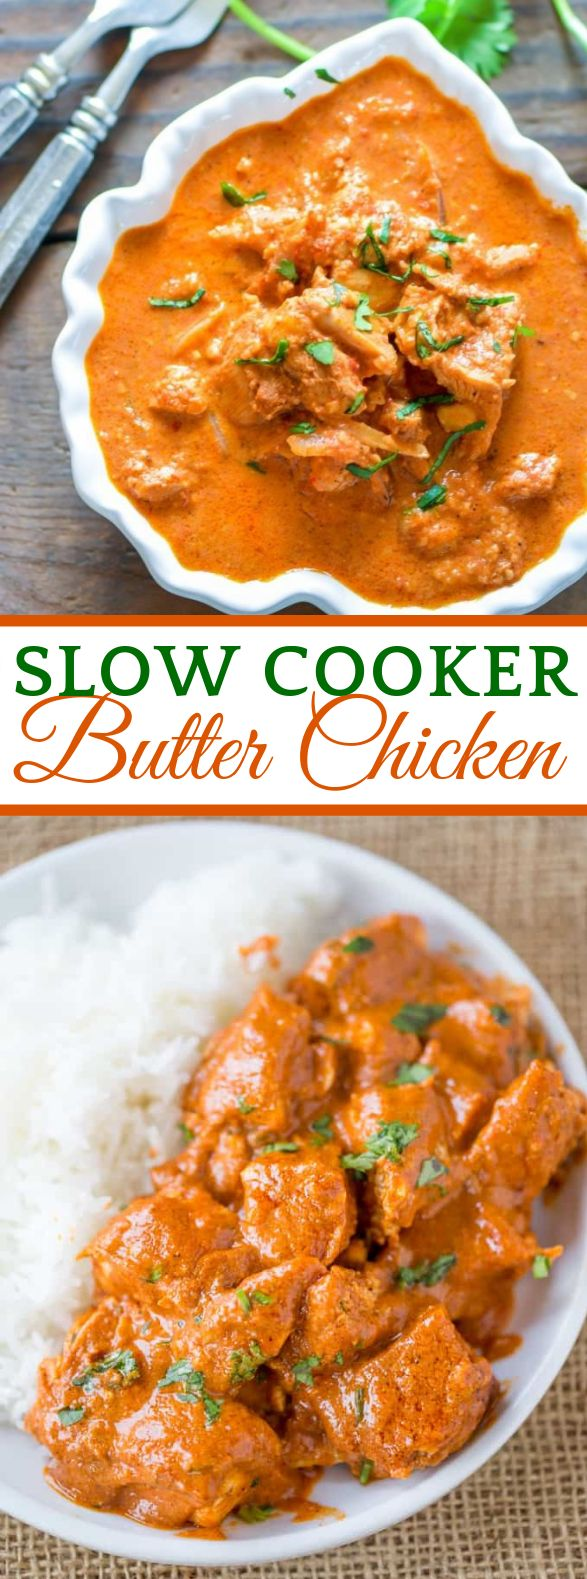 SLOW COOKER INDIAN BUTTER CHICKEN #dinner #indianfood